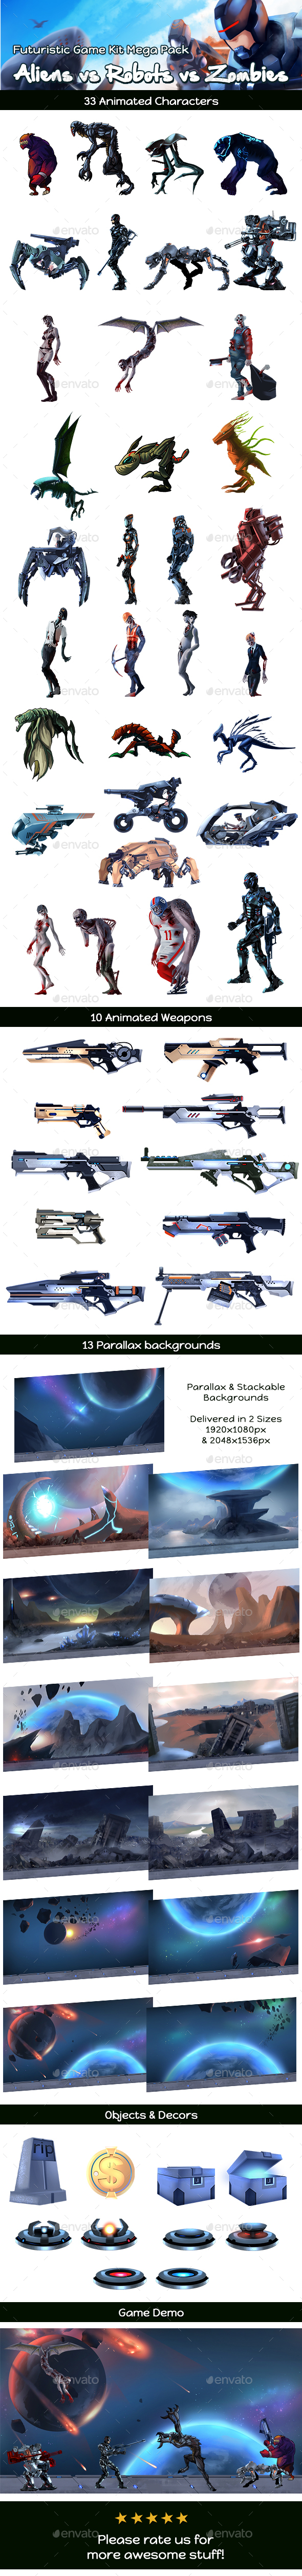 Aliens vs Robots vs Zombies Game Assets Mega Pack (Game Kits)